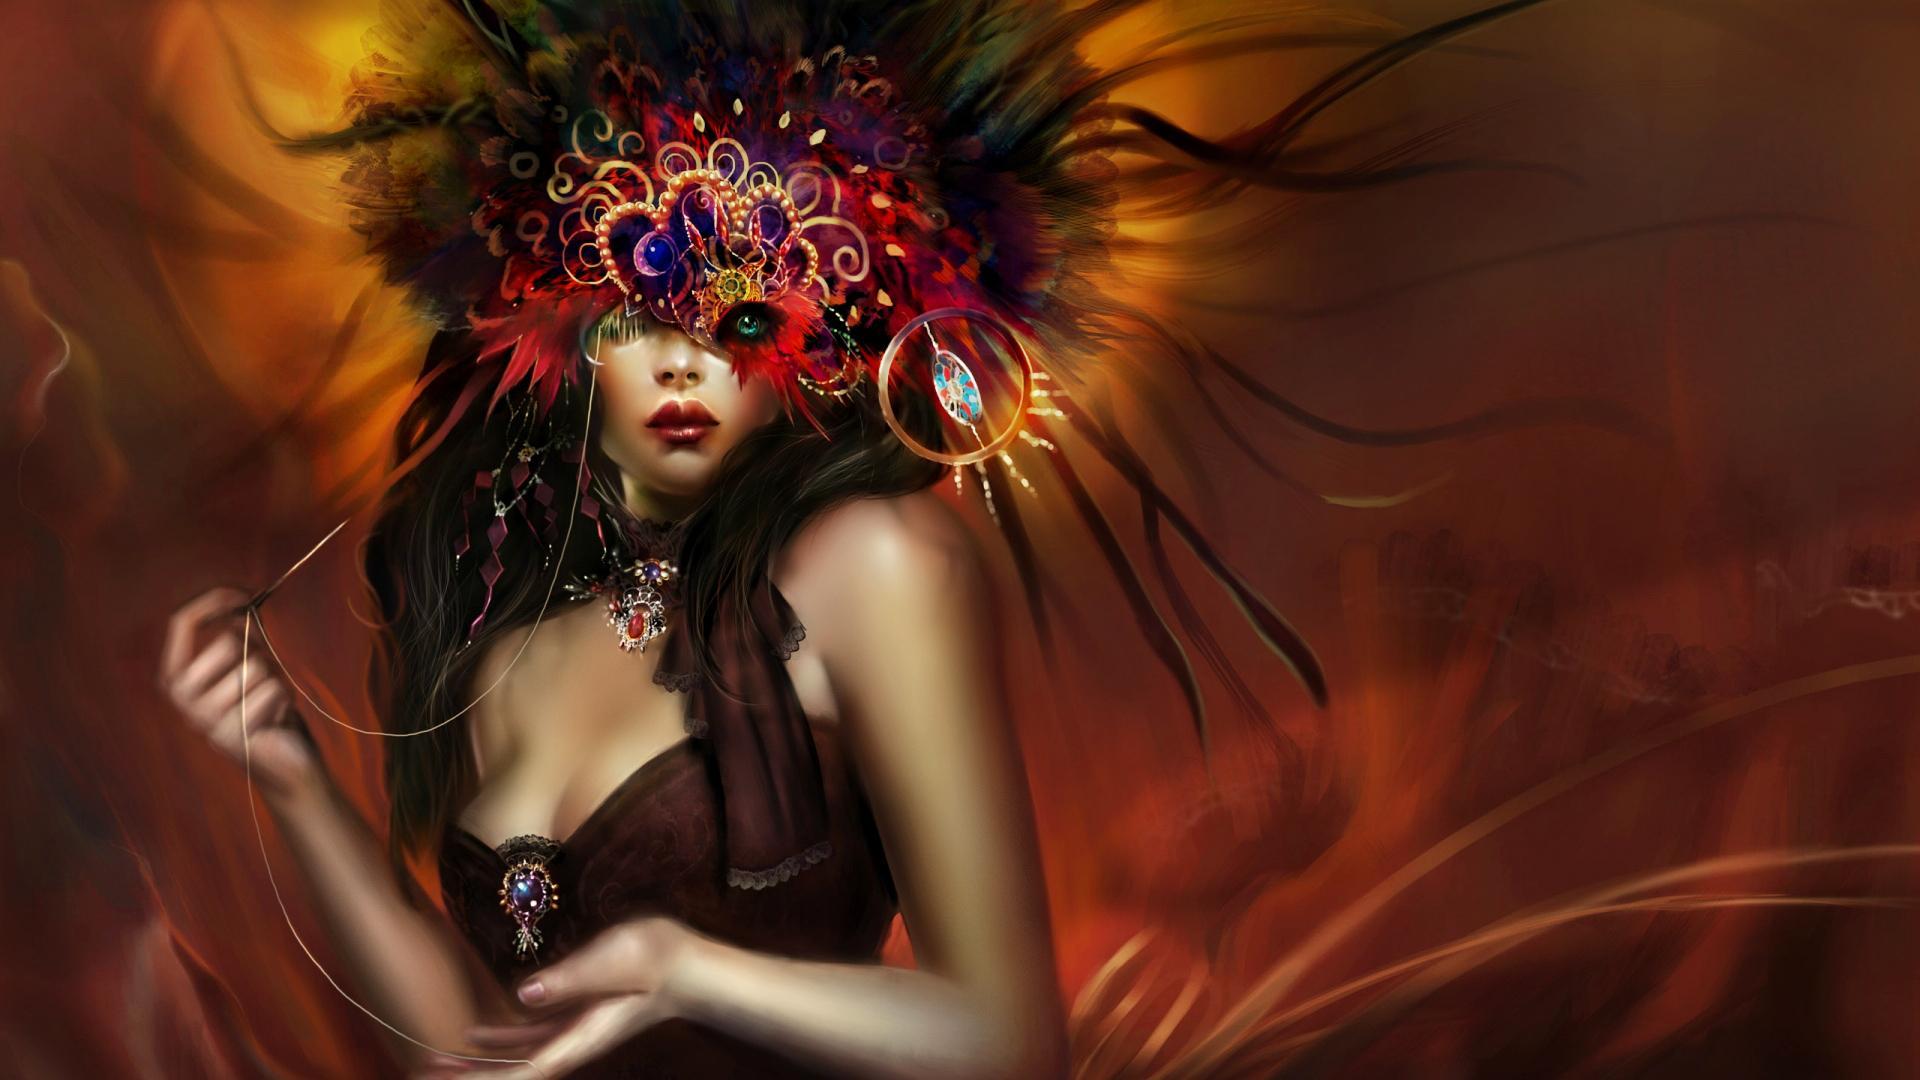 Fantasy Women Wallpaper/Background 1920 x 1080 - Id: 303672 - Wallpaper Abyss